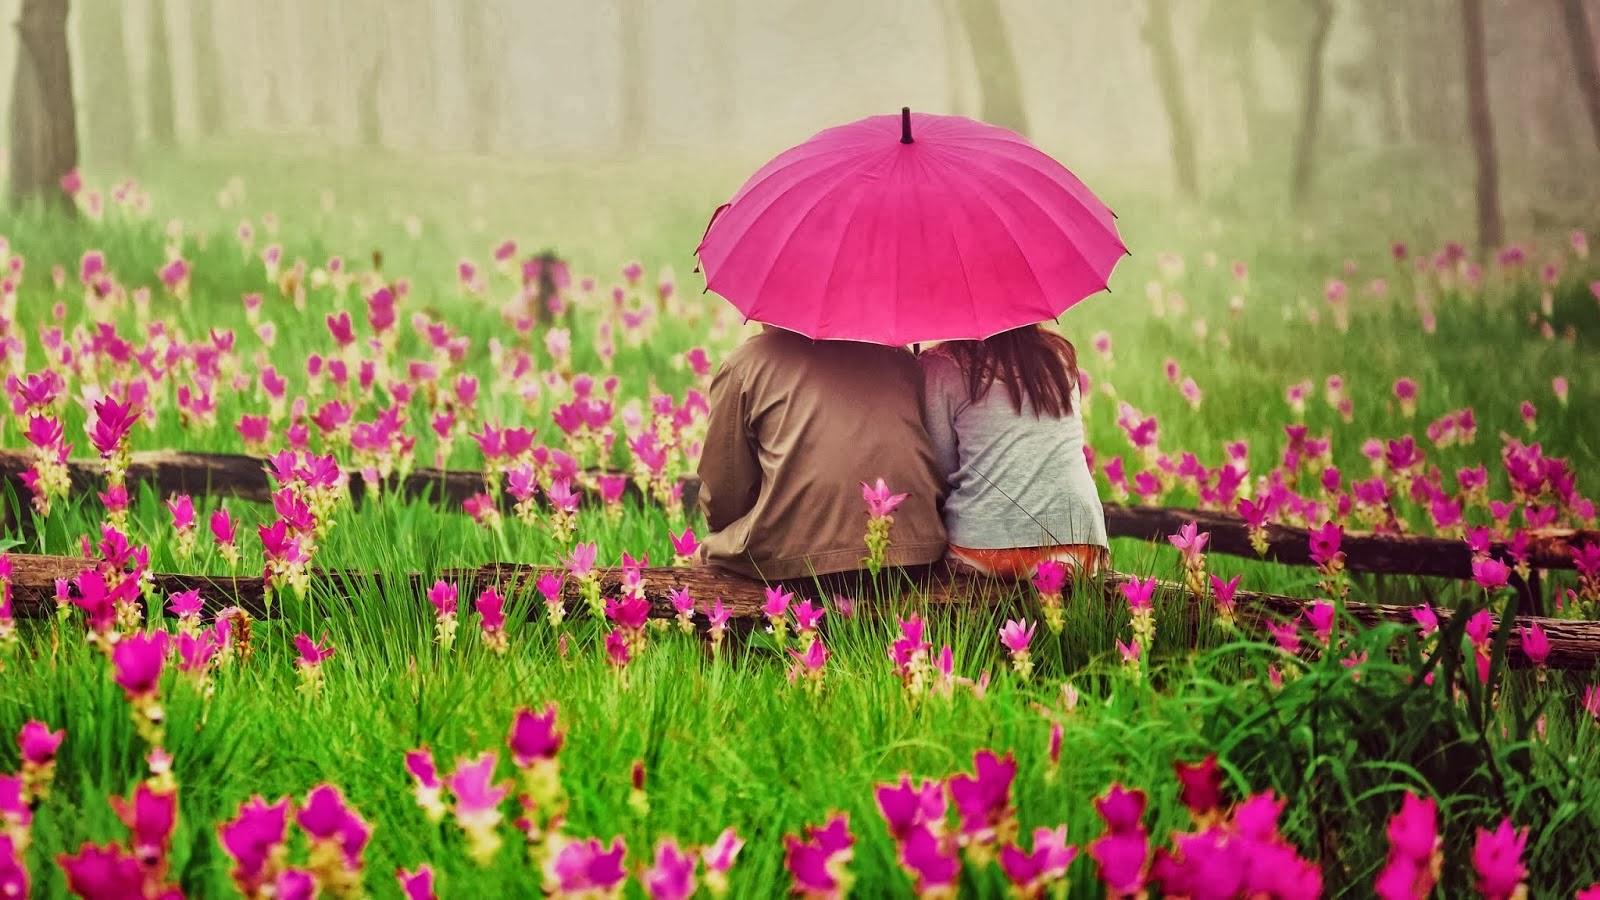 Hd wallpaper romantic - Romantic Couple Hd Wallpaper And Image Couple And Umbrella